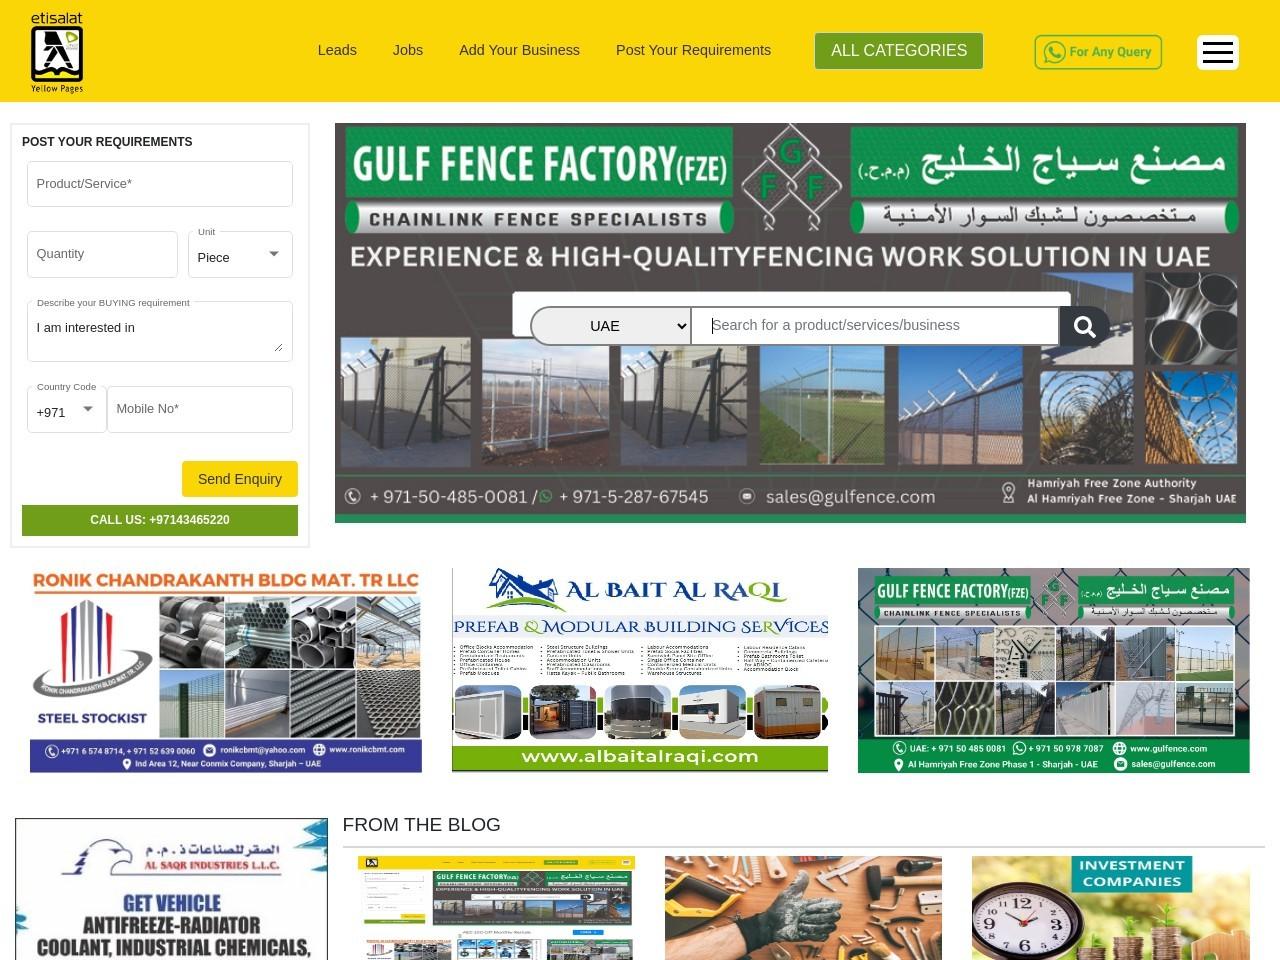 Office Furniture Suppliers in UAE | office chair retailer in UAE